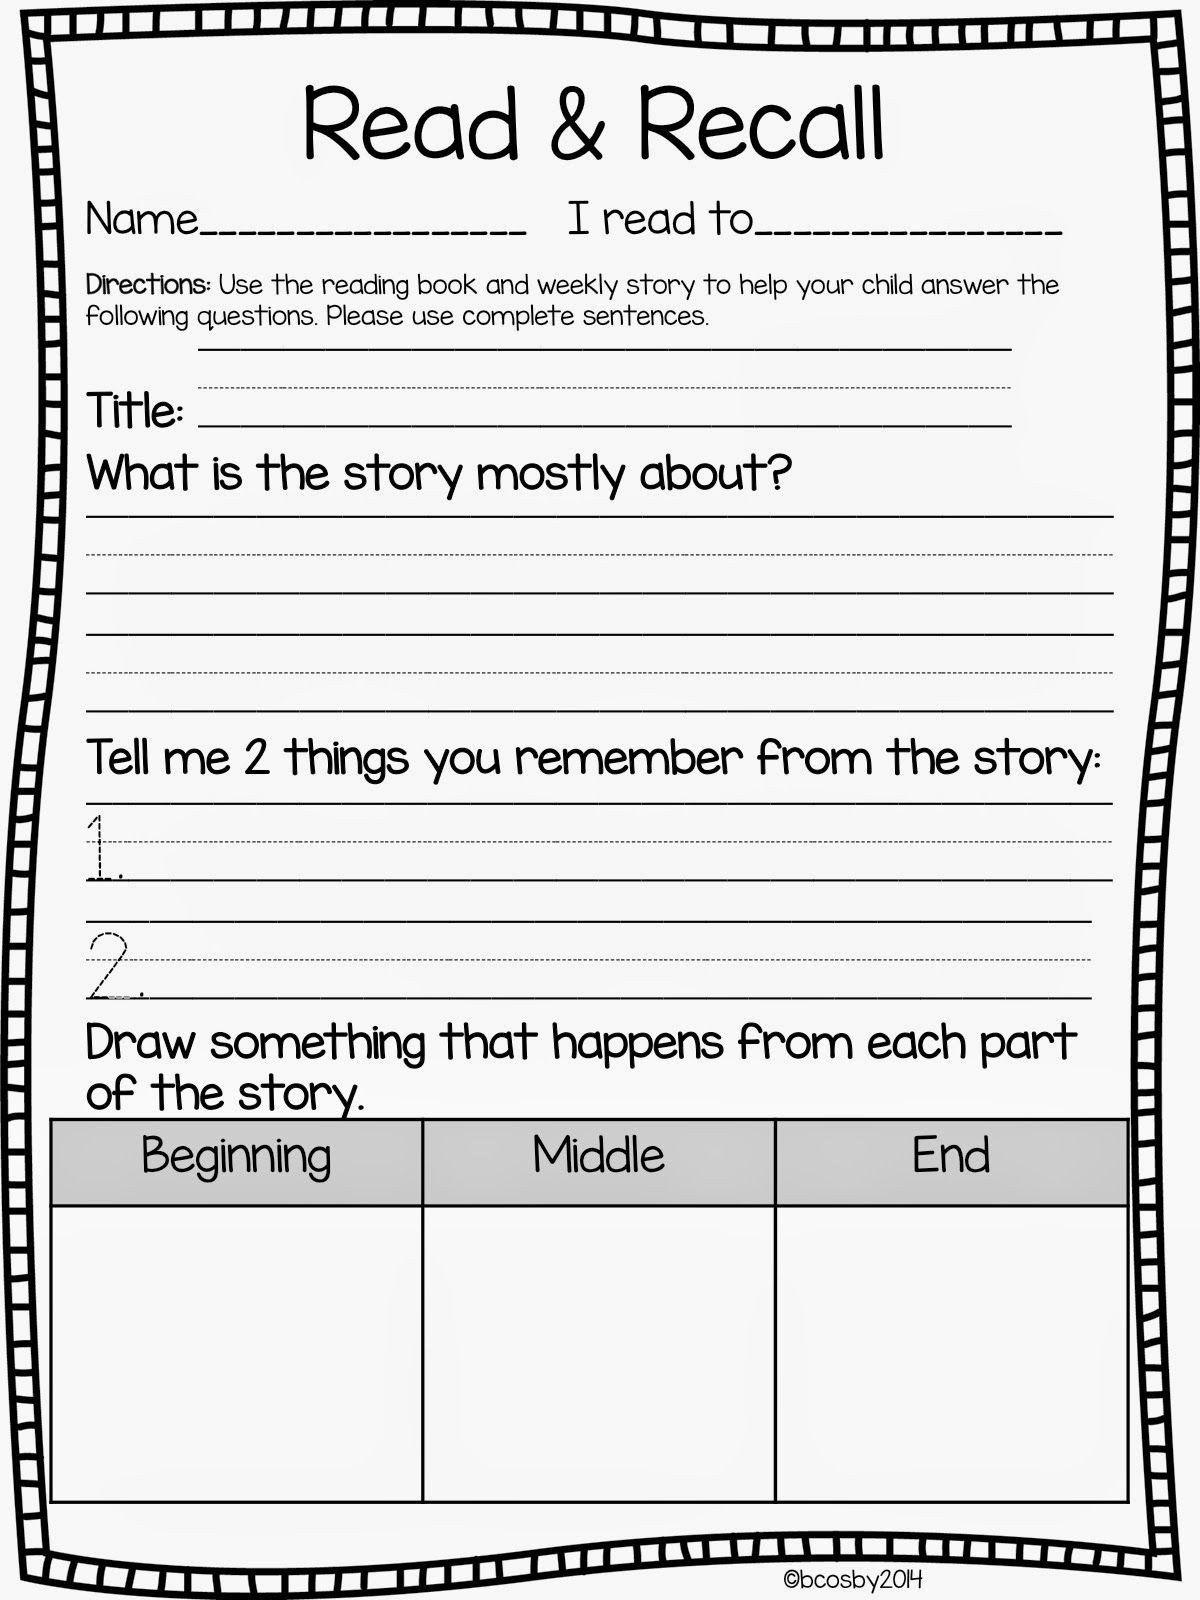 Second Grade Reading Comprehension Stories Math Worksheet